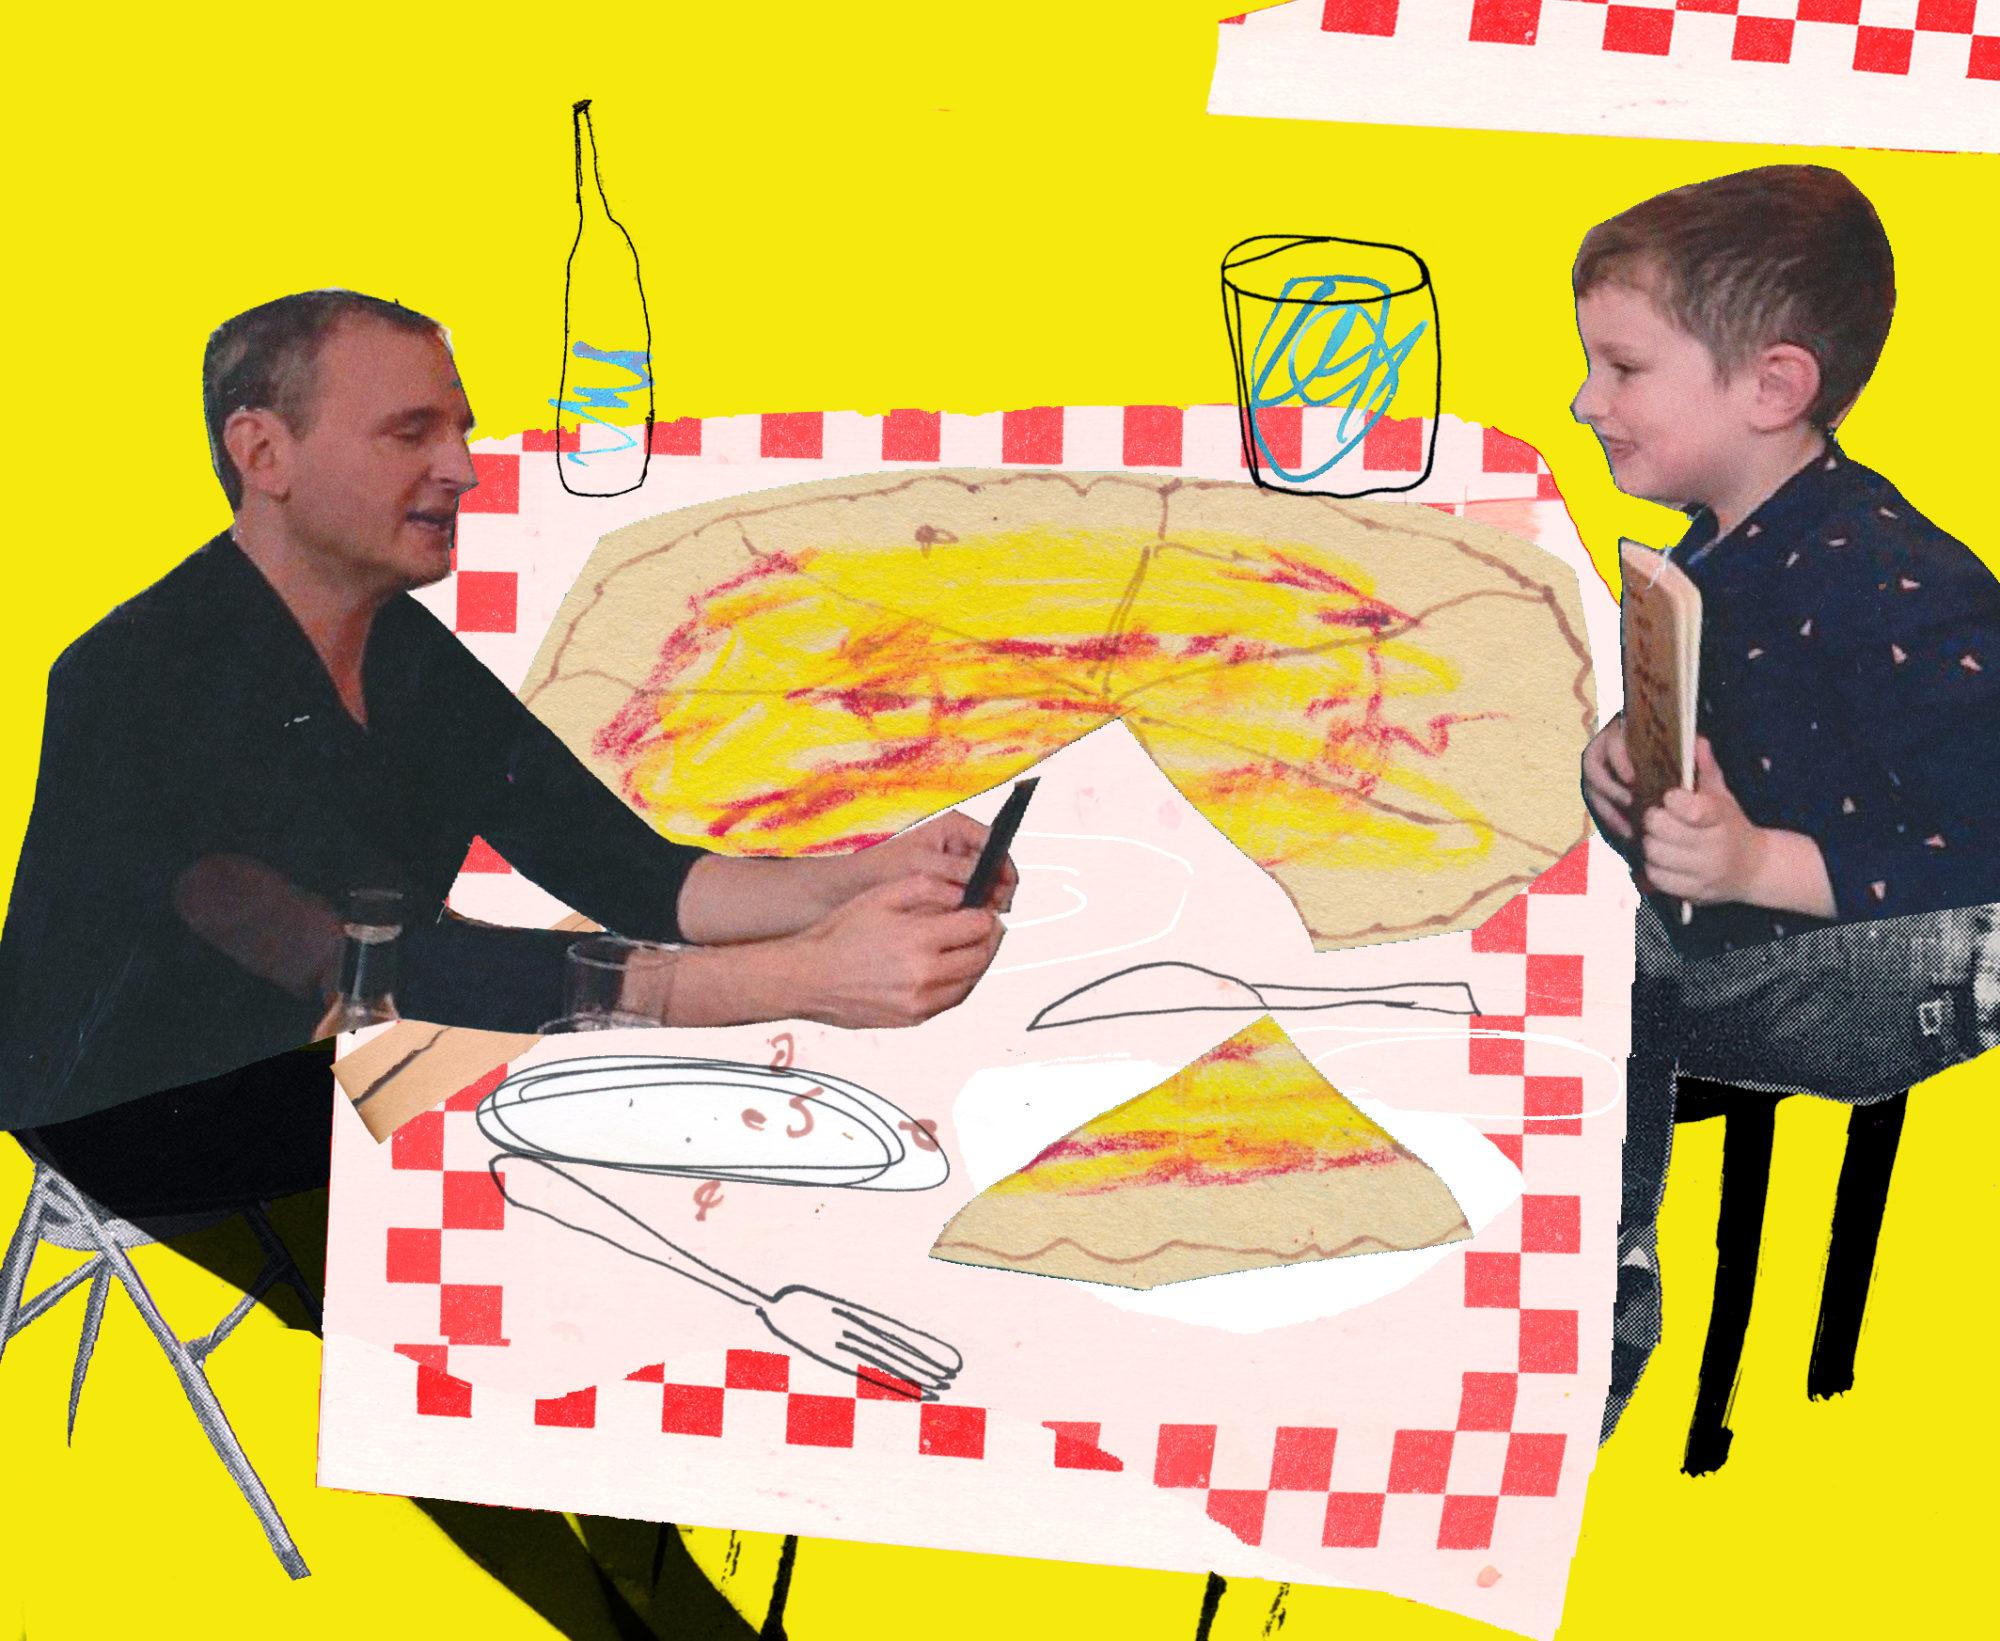 pizza_yellow